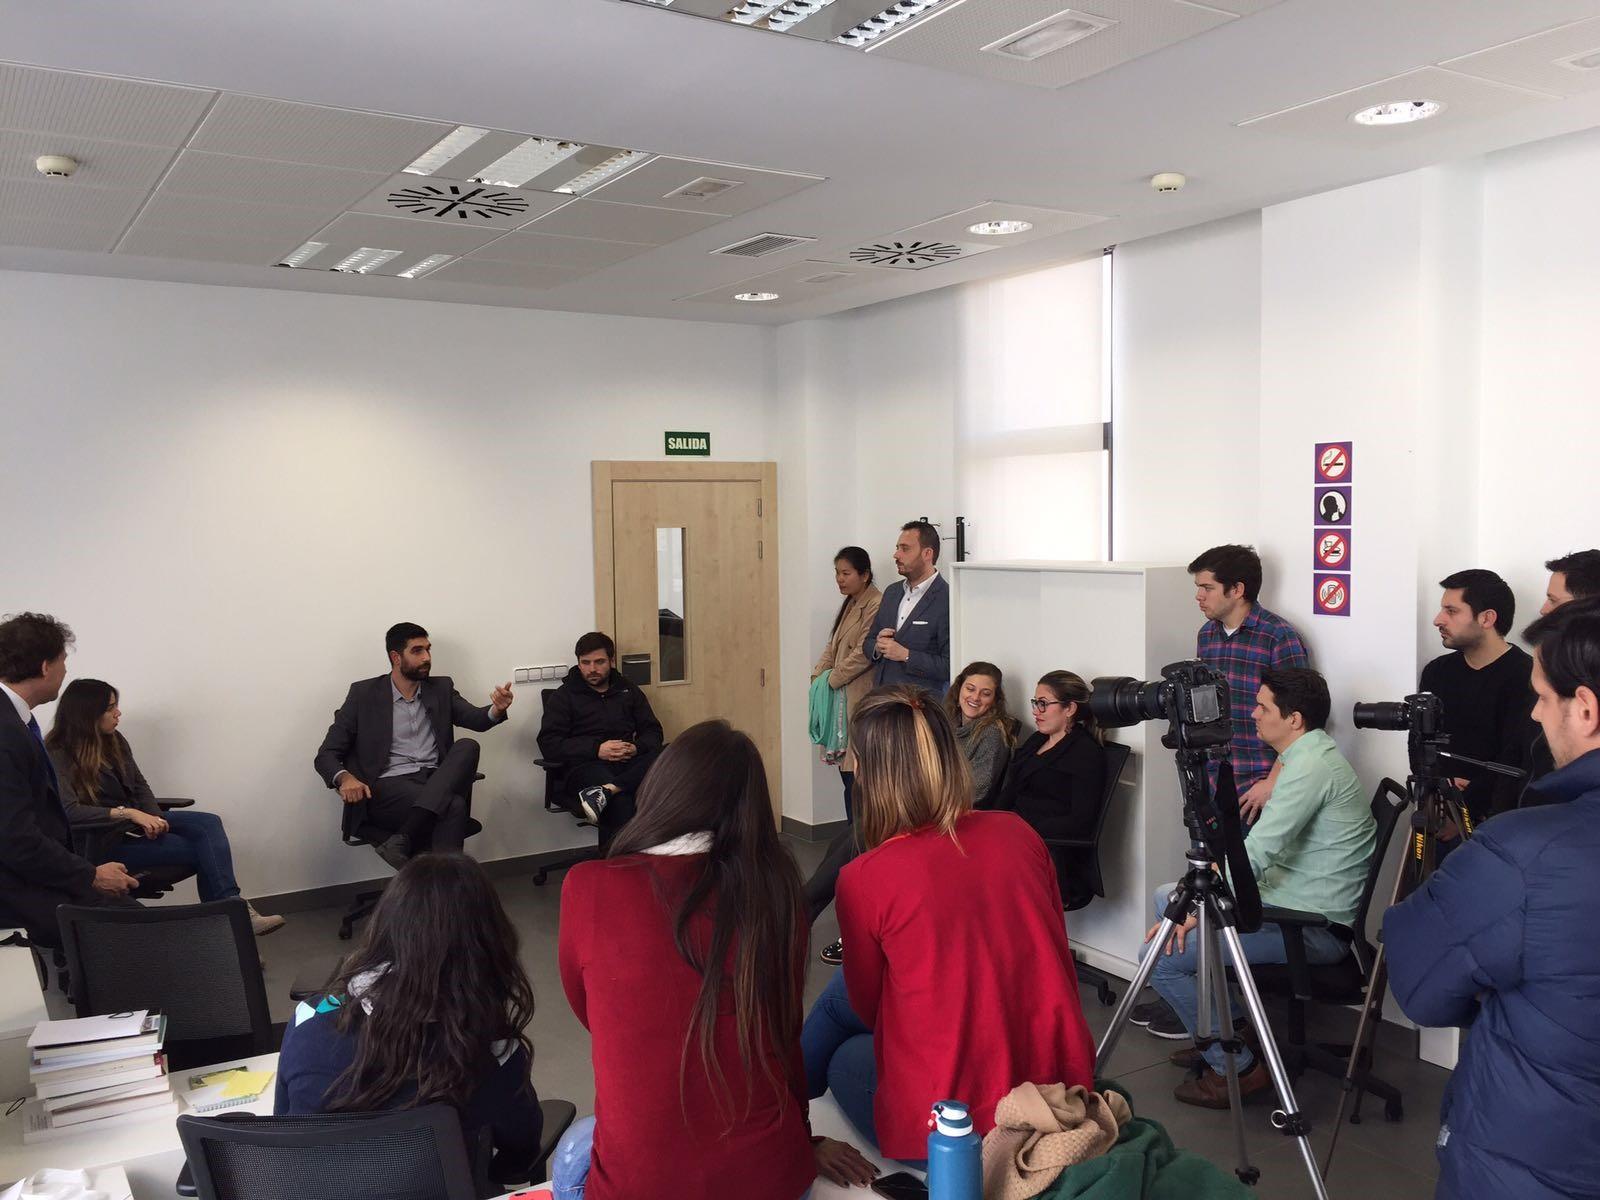 Visita de los alumnos del IMBA a la incubadora